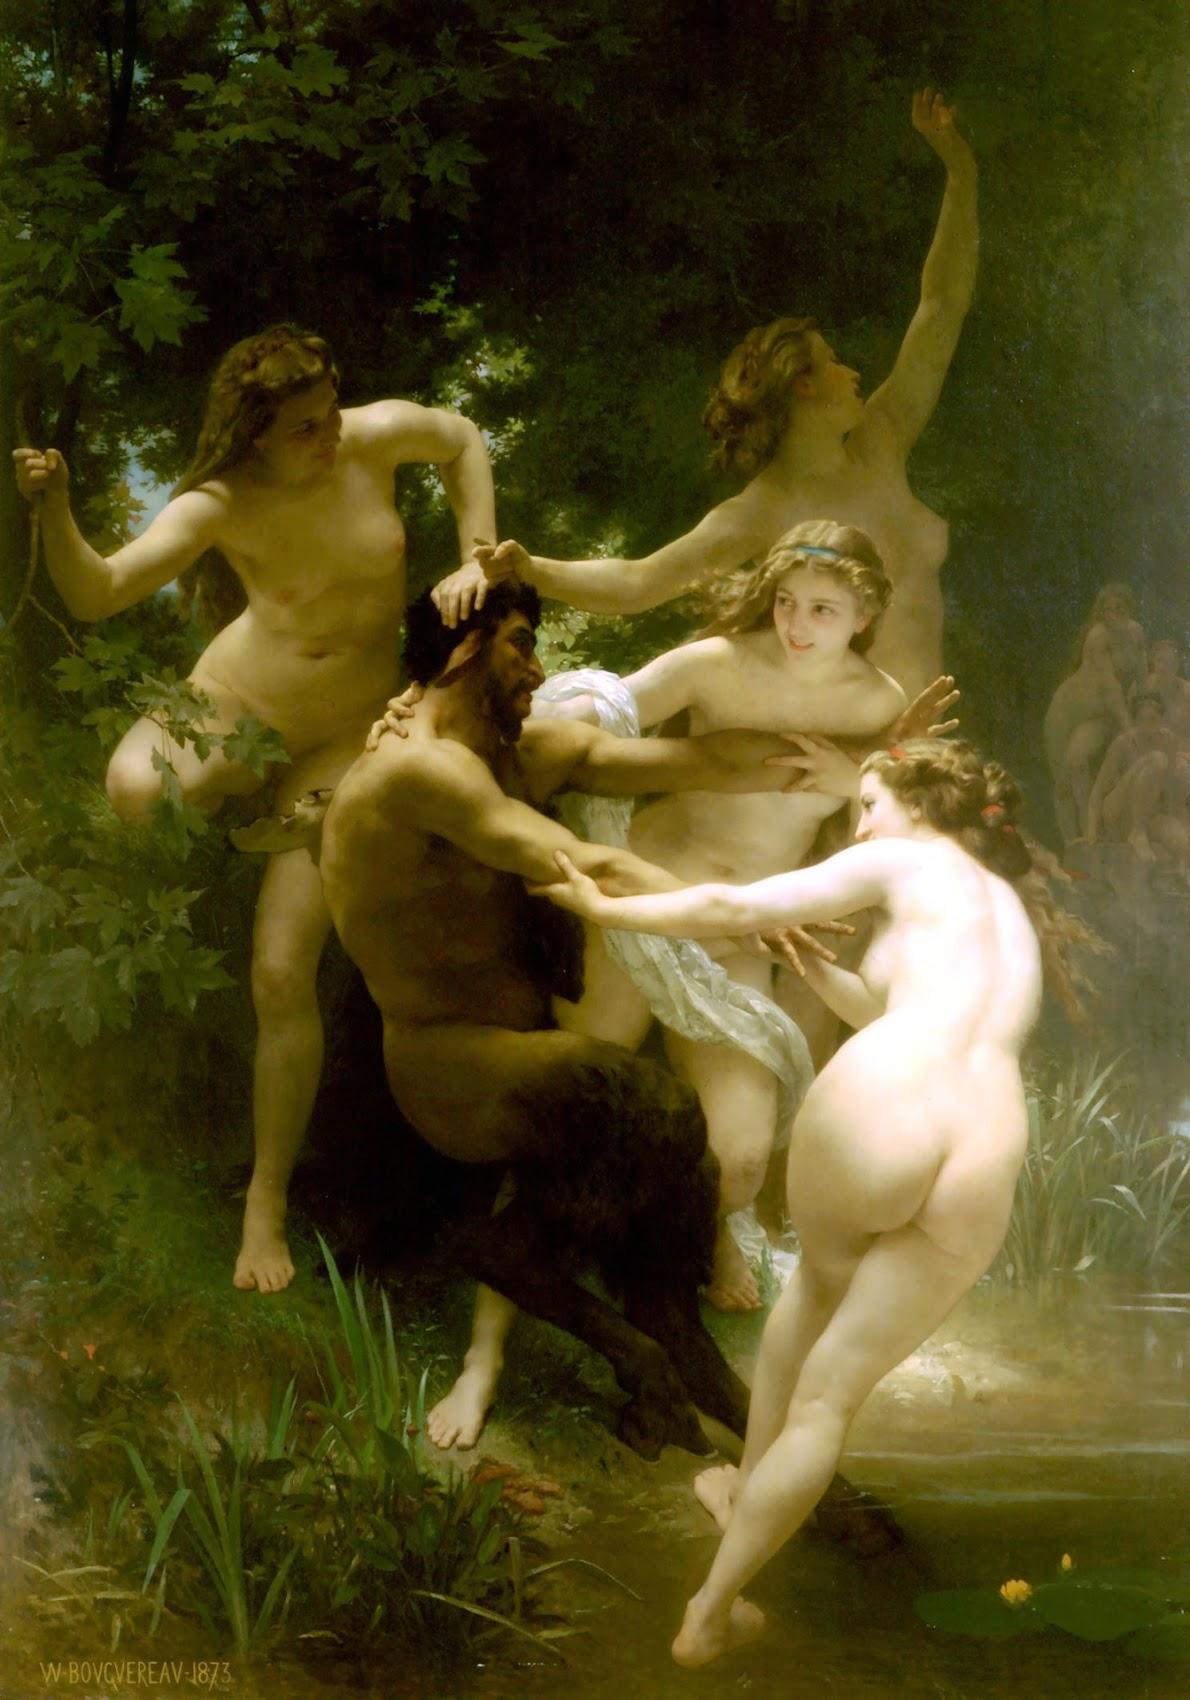 http://3.bp.blogspot.com/-BAwwu09IBjs/Tz7BRnKxozI/AAAAAAAAS5c/2cX7bguZFzQ/s1700/Nymphs-and-Satyr-greek-mythology-687160_1344_1920.jpg